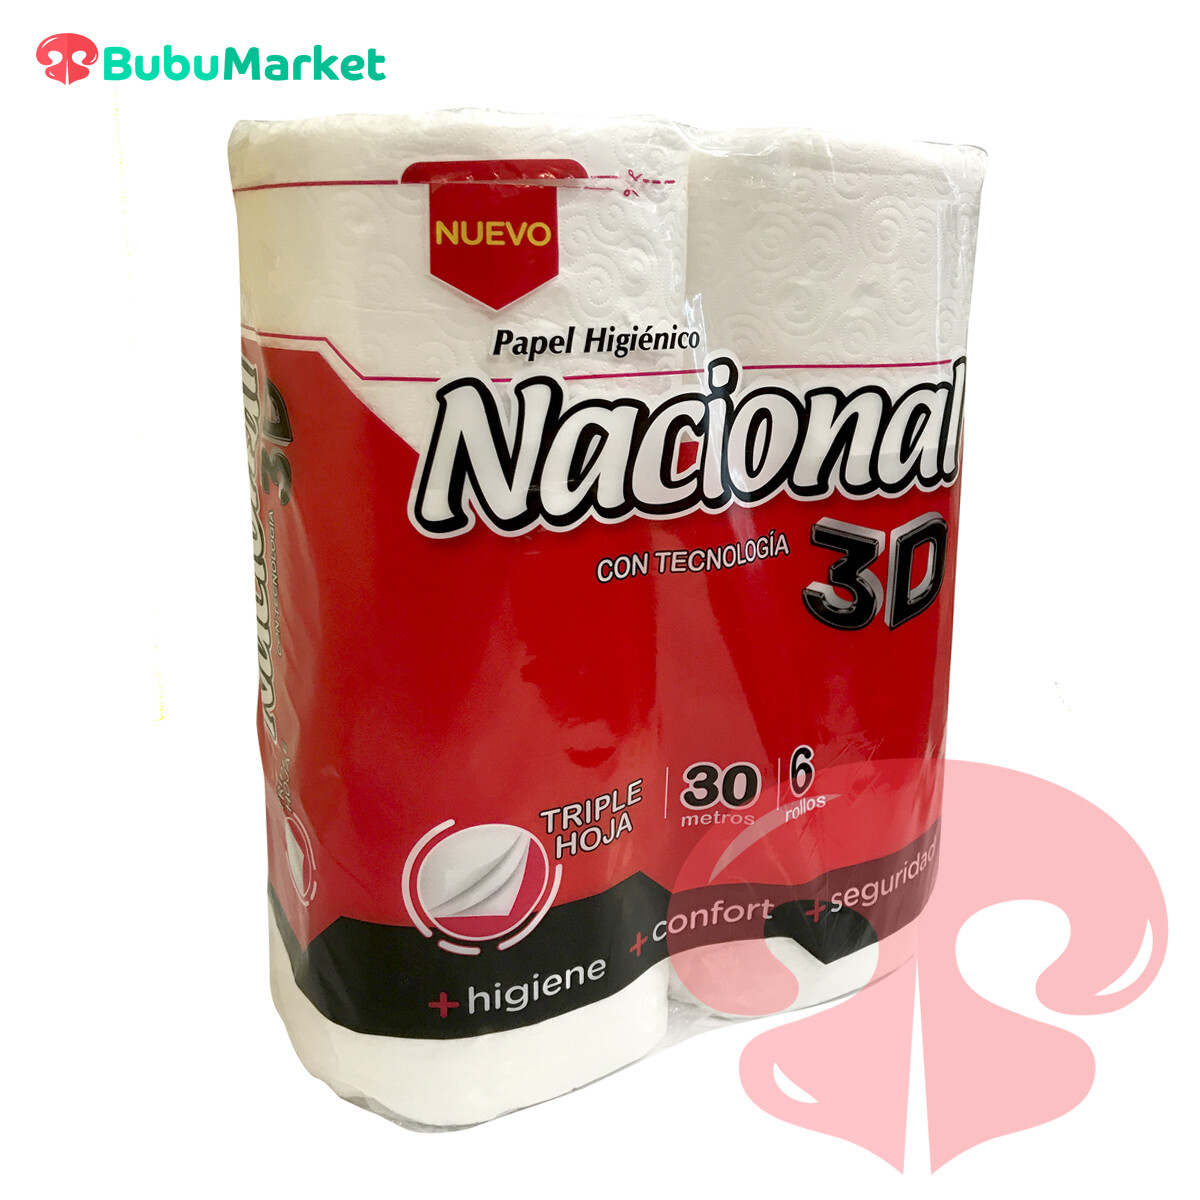 PAPEL HIGIENICO NACIONAL TRIPLE HOJA 3D 6 ROLLOS